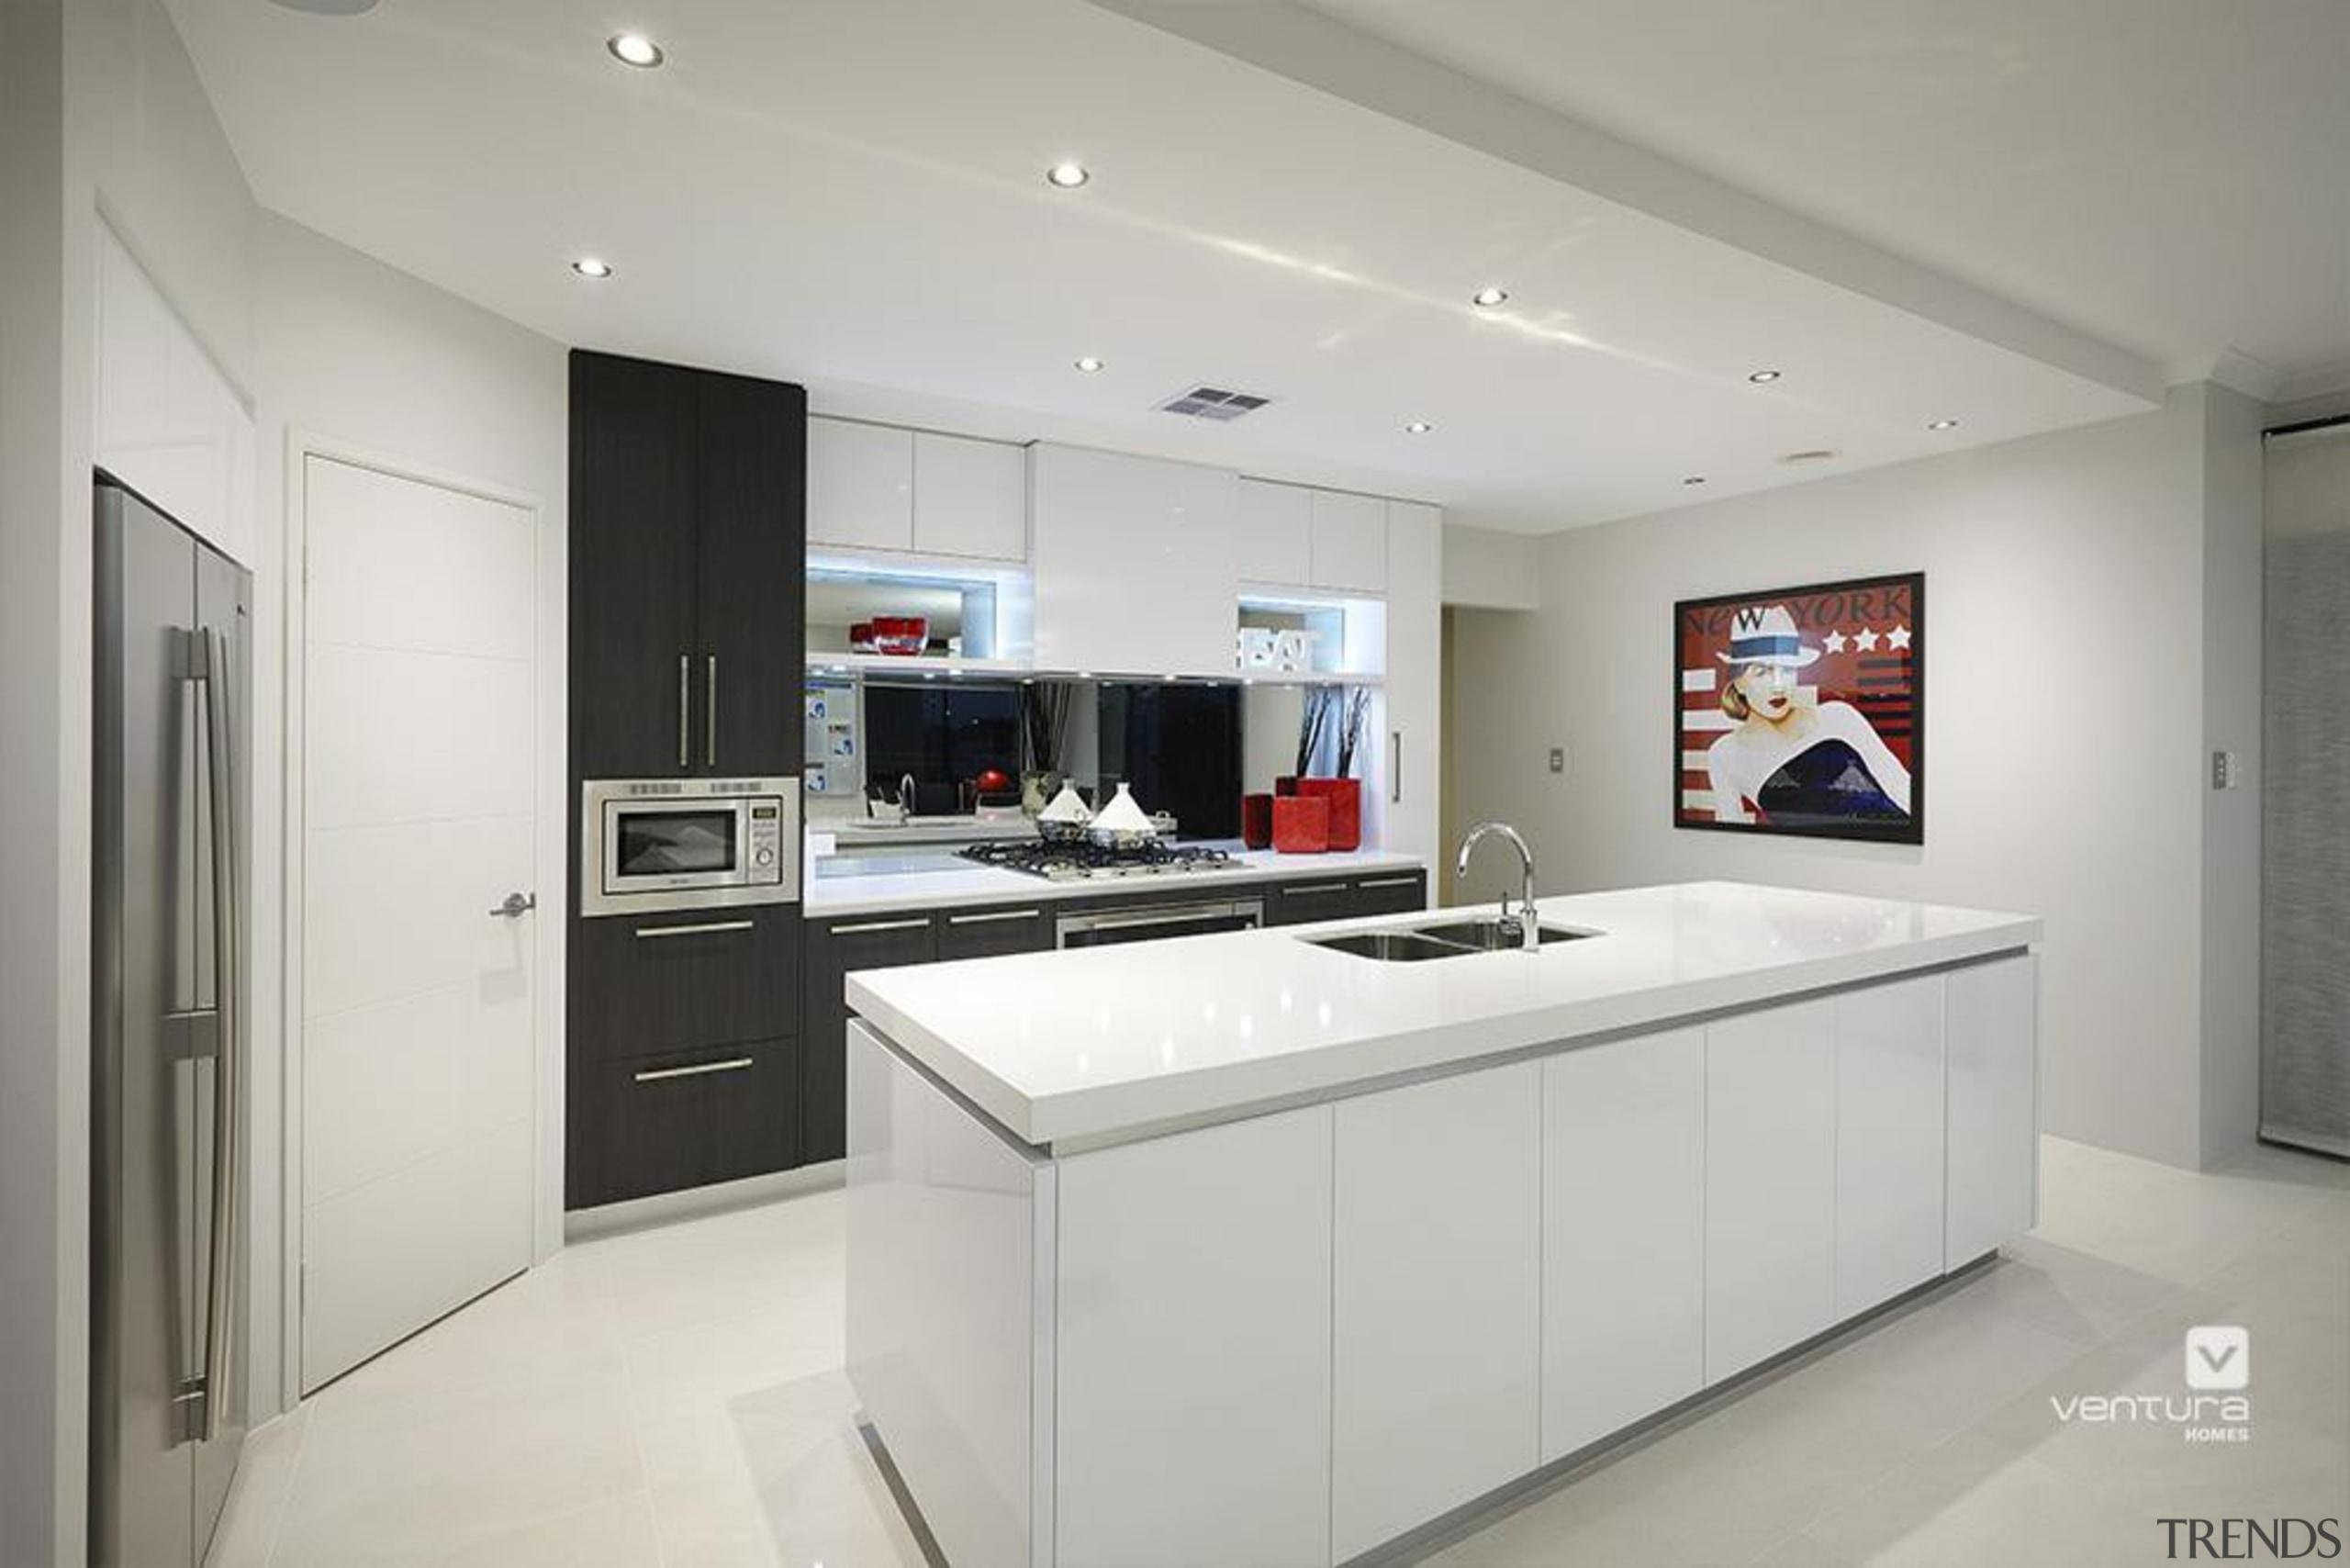 Kitchen design. - The Montrose Display Home - cabinetry, countertop, cuisine classique, interior design, kitchen, real estate, room, gray